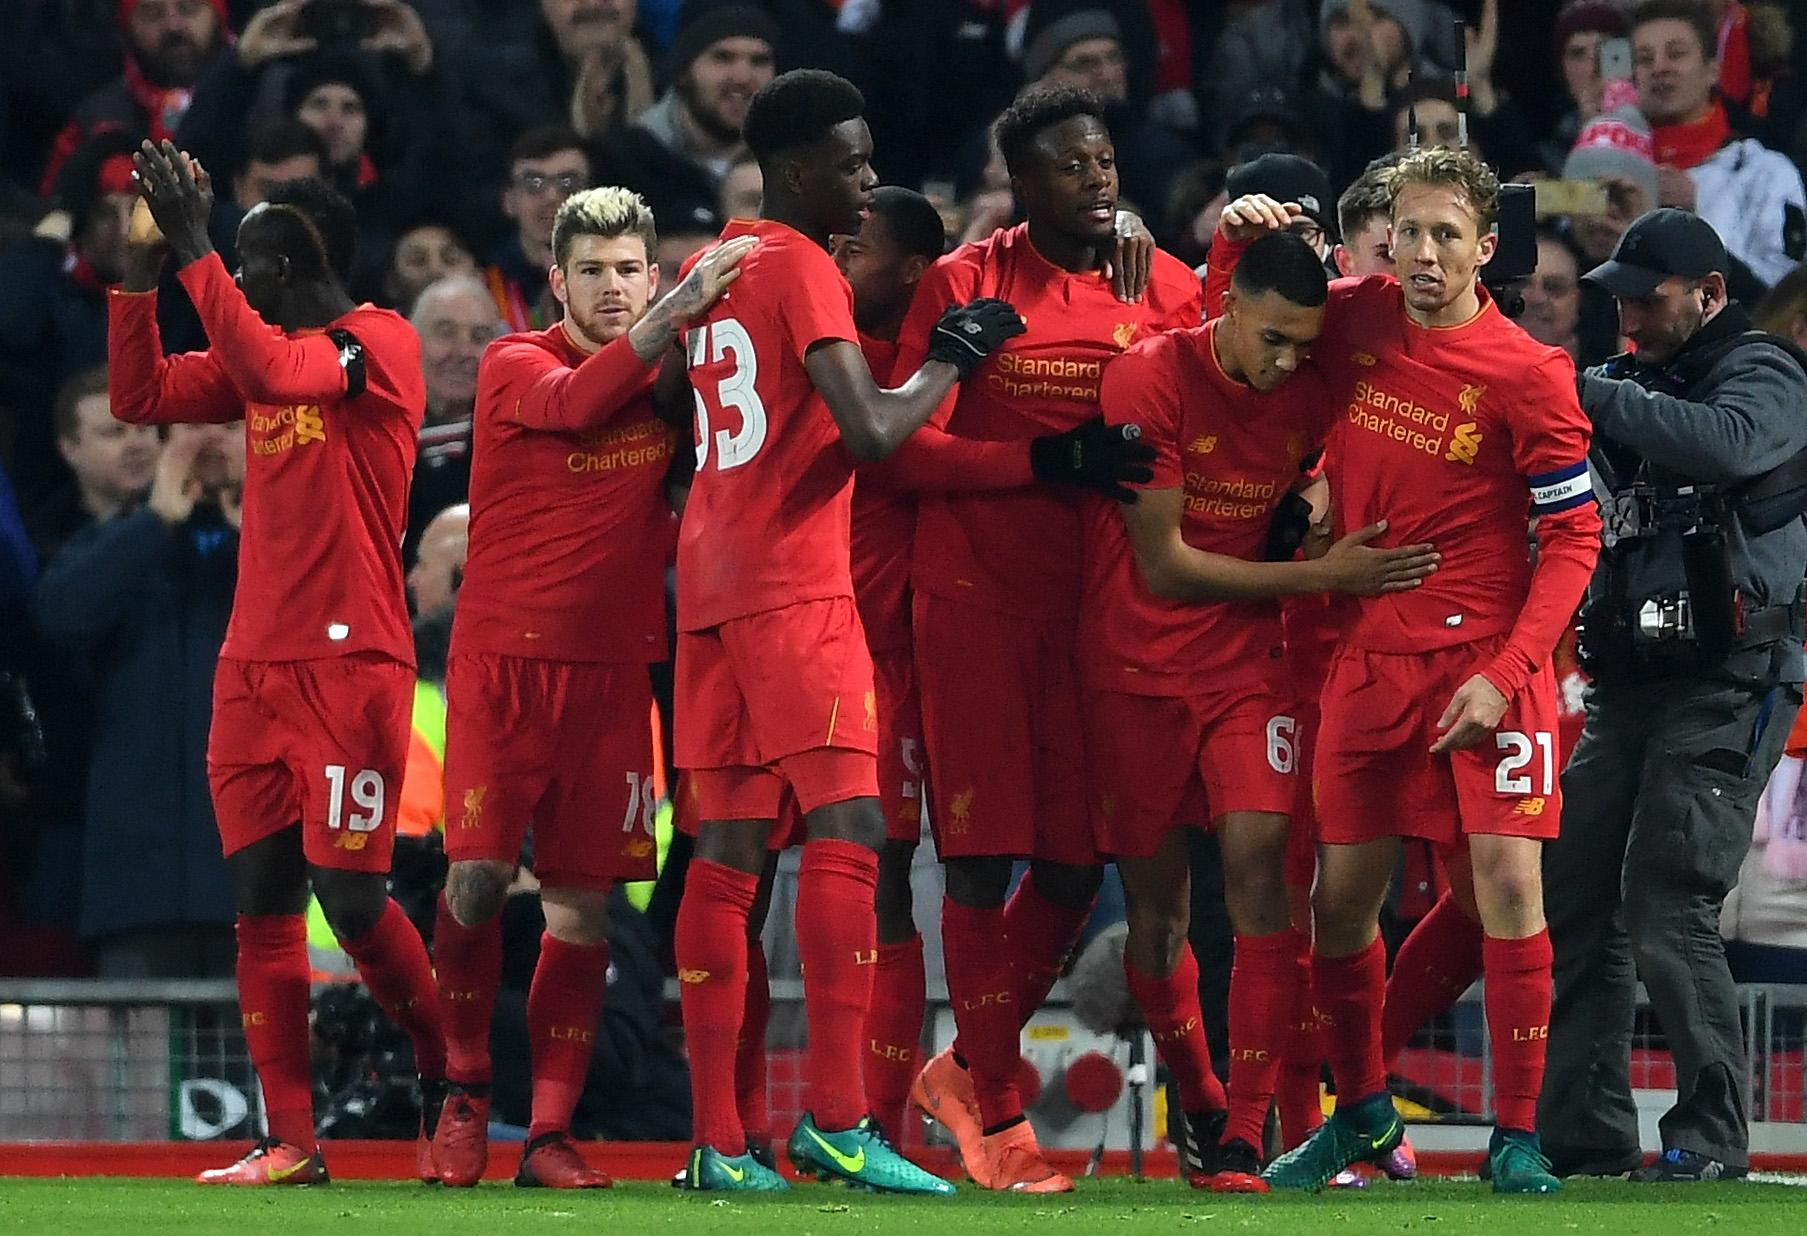 Liverpool 2-0 Leeds hits and misses: Divock Origi fires while Ovie Ejaria and Lucas Leiva stumble